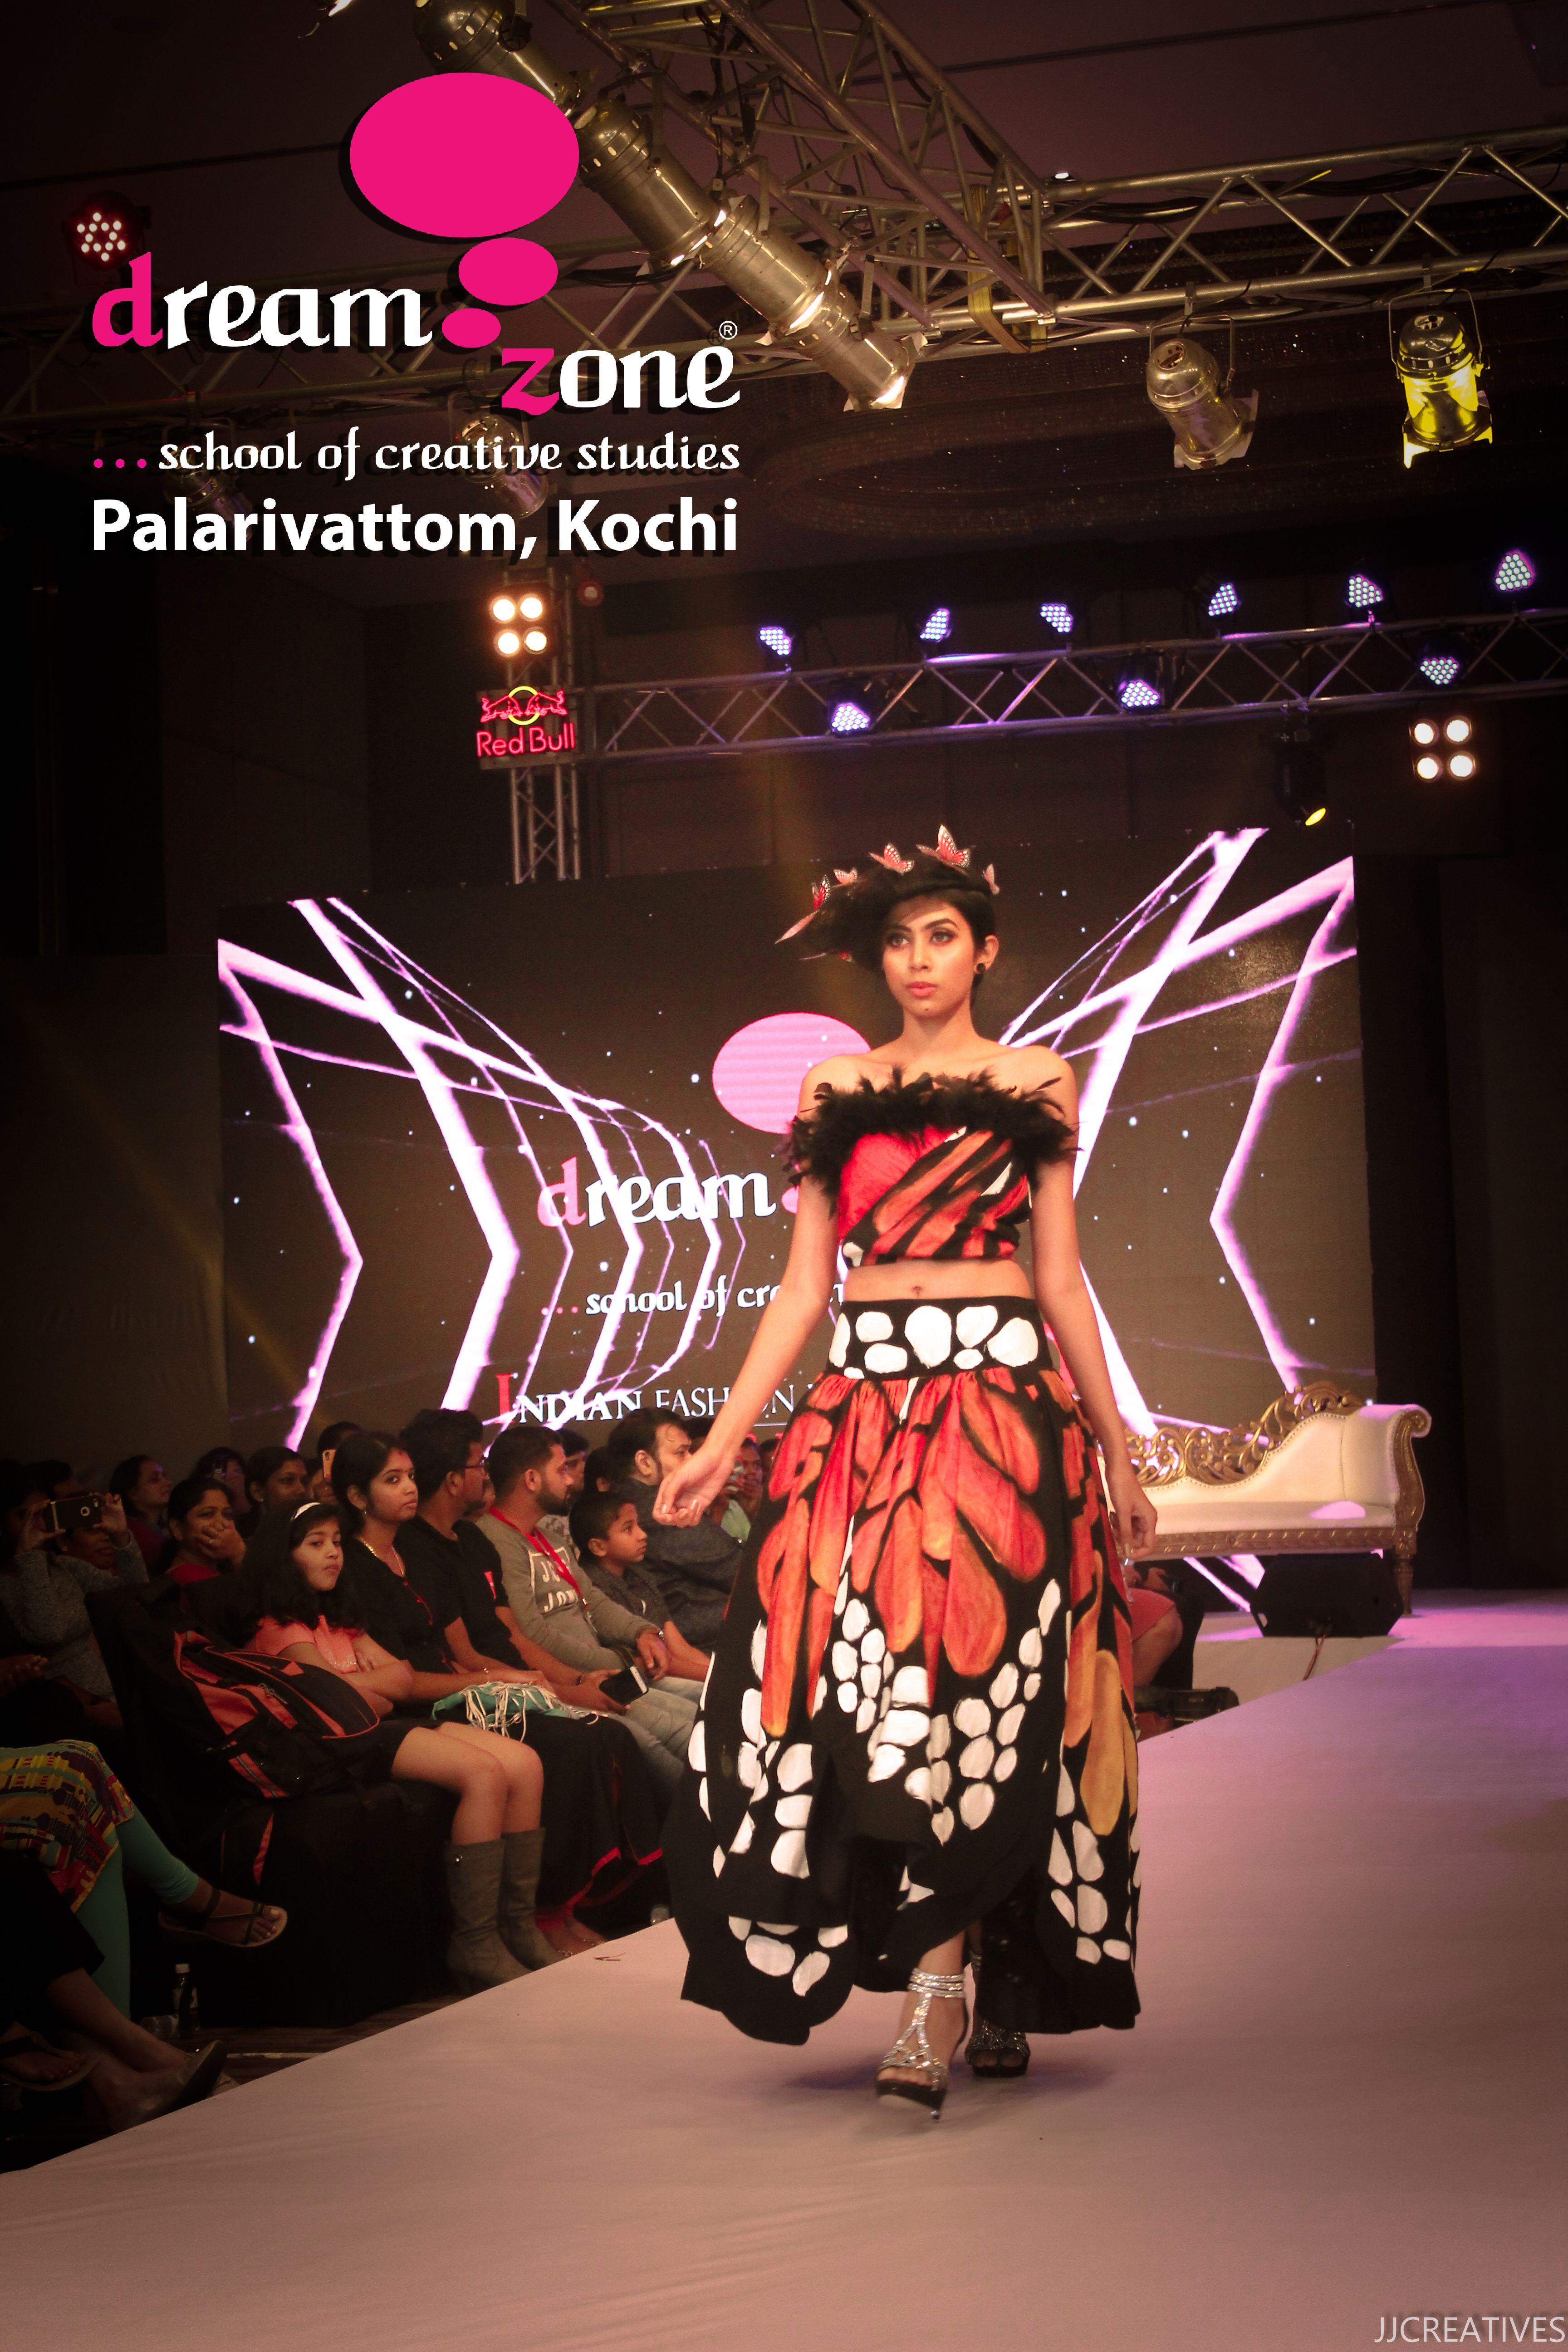 Dreamzone Training Institute Offering Professional Designing Courses In Interior Design Fashio Fashion Designing Institute Graphic Design Course Fashion Design